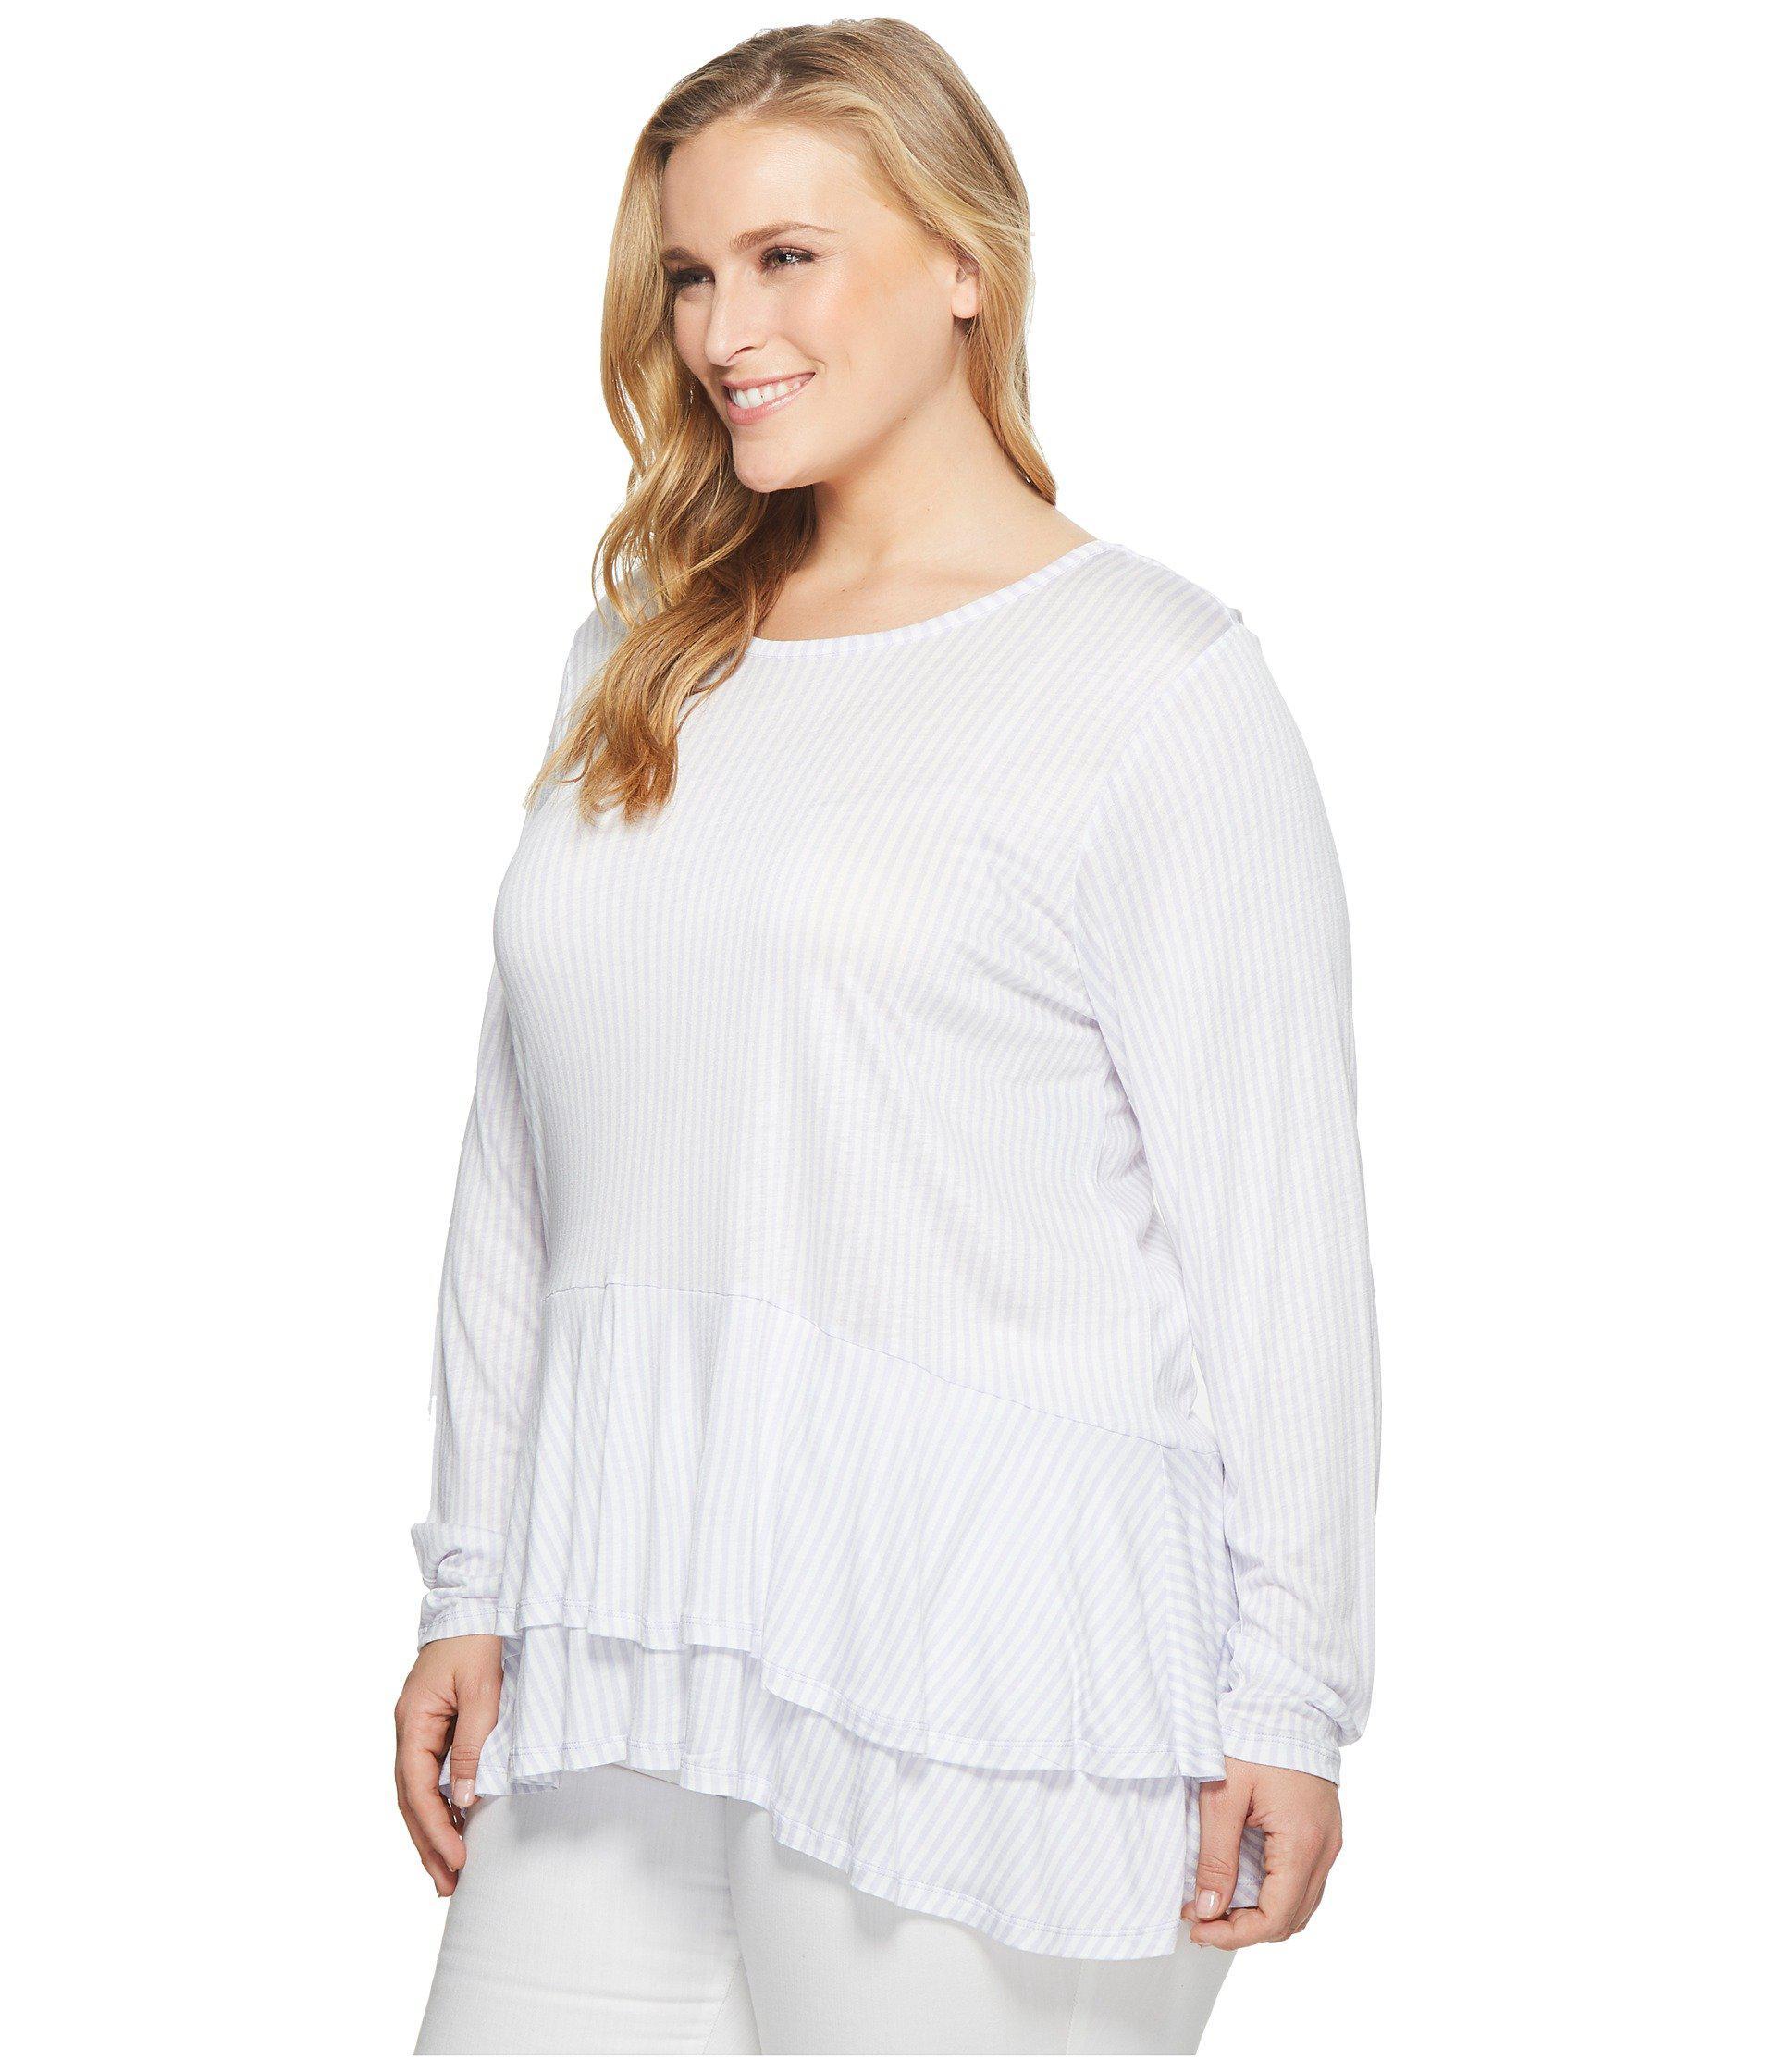 b6253aefade Lyst - MICHAEL Michael Kors Plus Size Petite Stripe Double Hem Top in White  - Save 14%